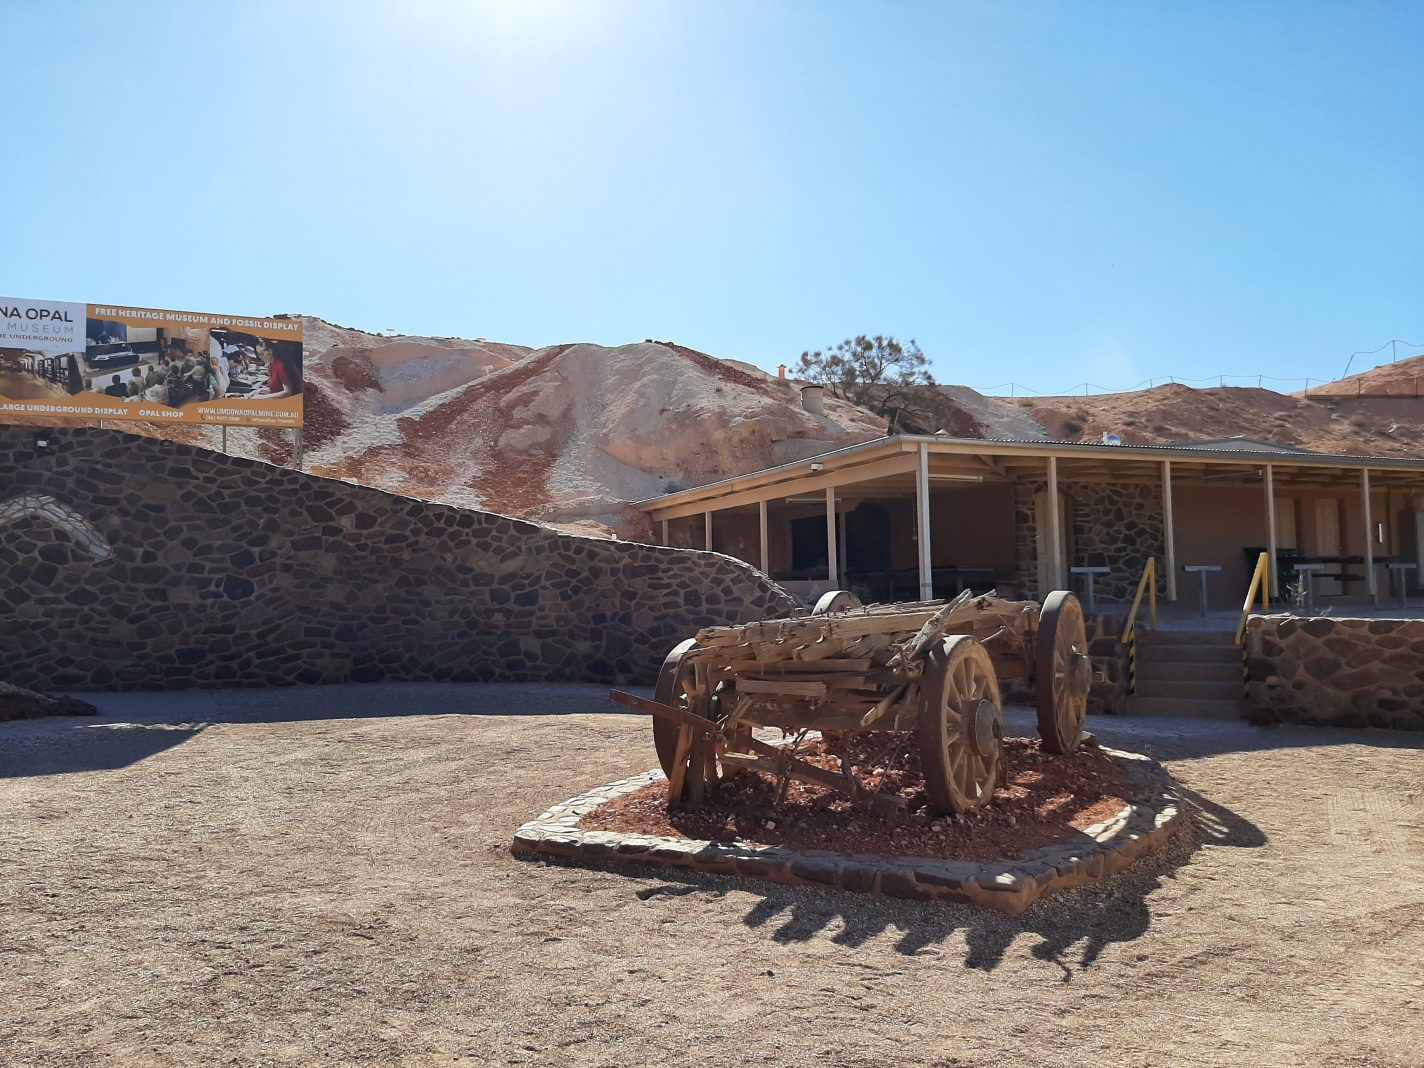 Umoona Opal Mine & Museum - Coober Pedy Australië